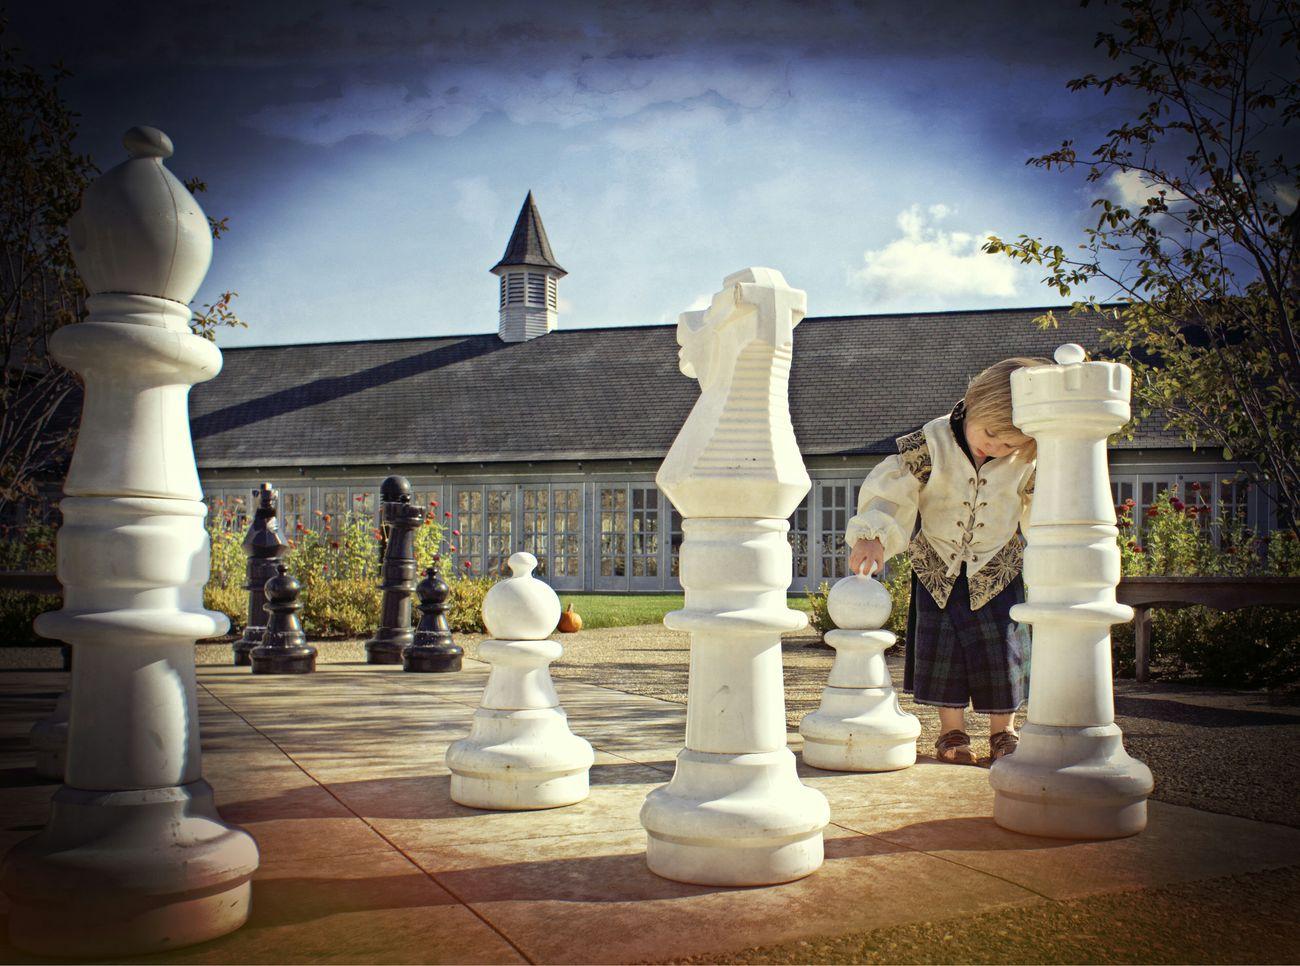 Chesspieces Outdoor Fun Cute Kids Renaissance Castle Grounds Castle Farms Kilt Explorer Mirrorless